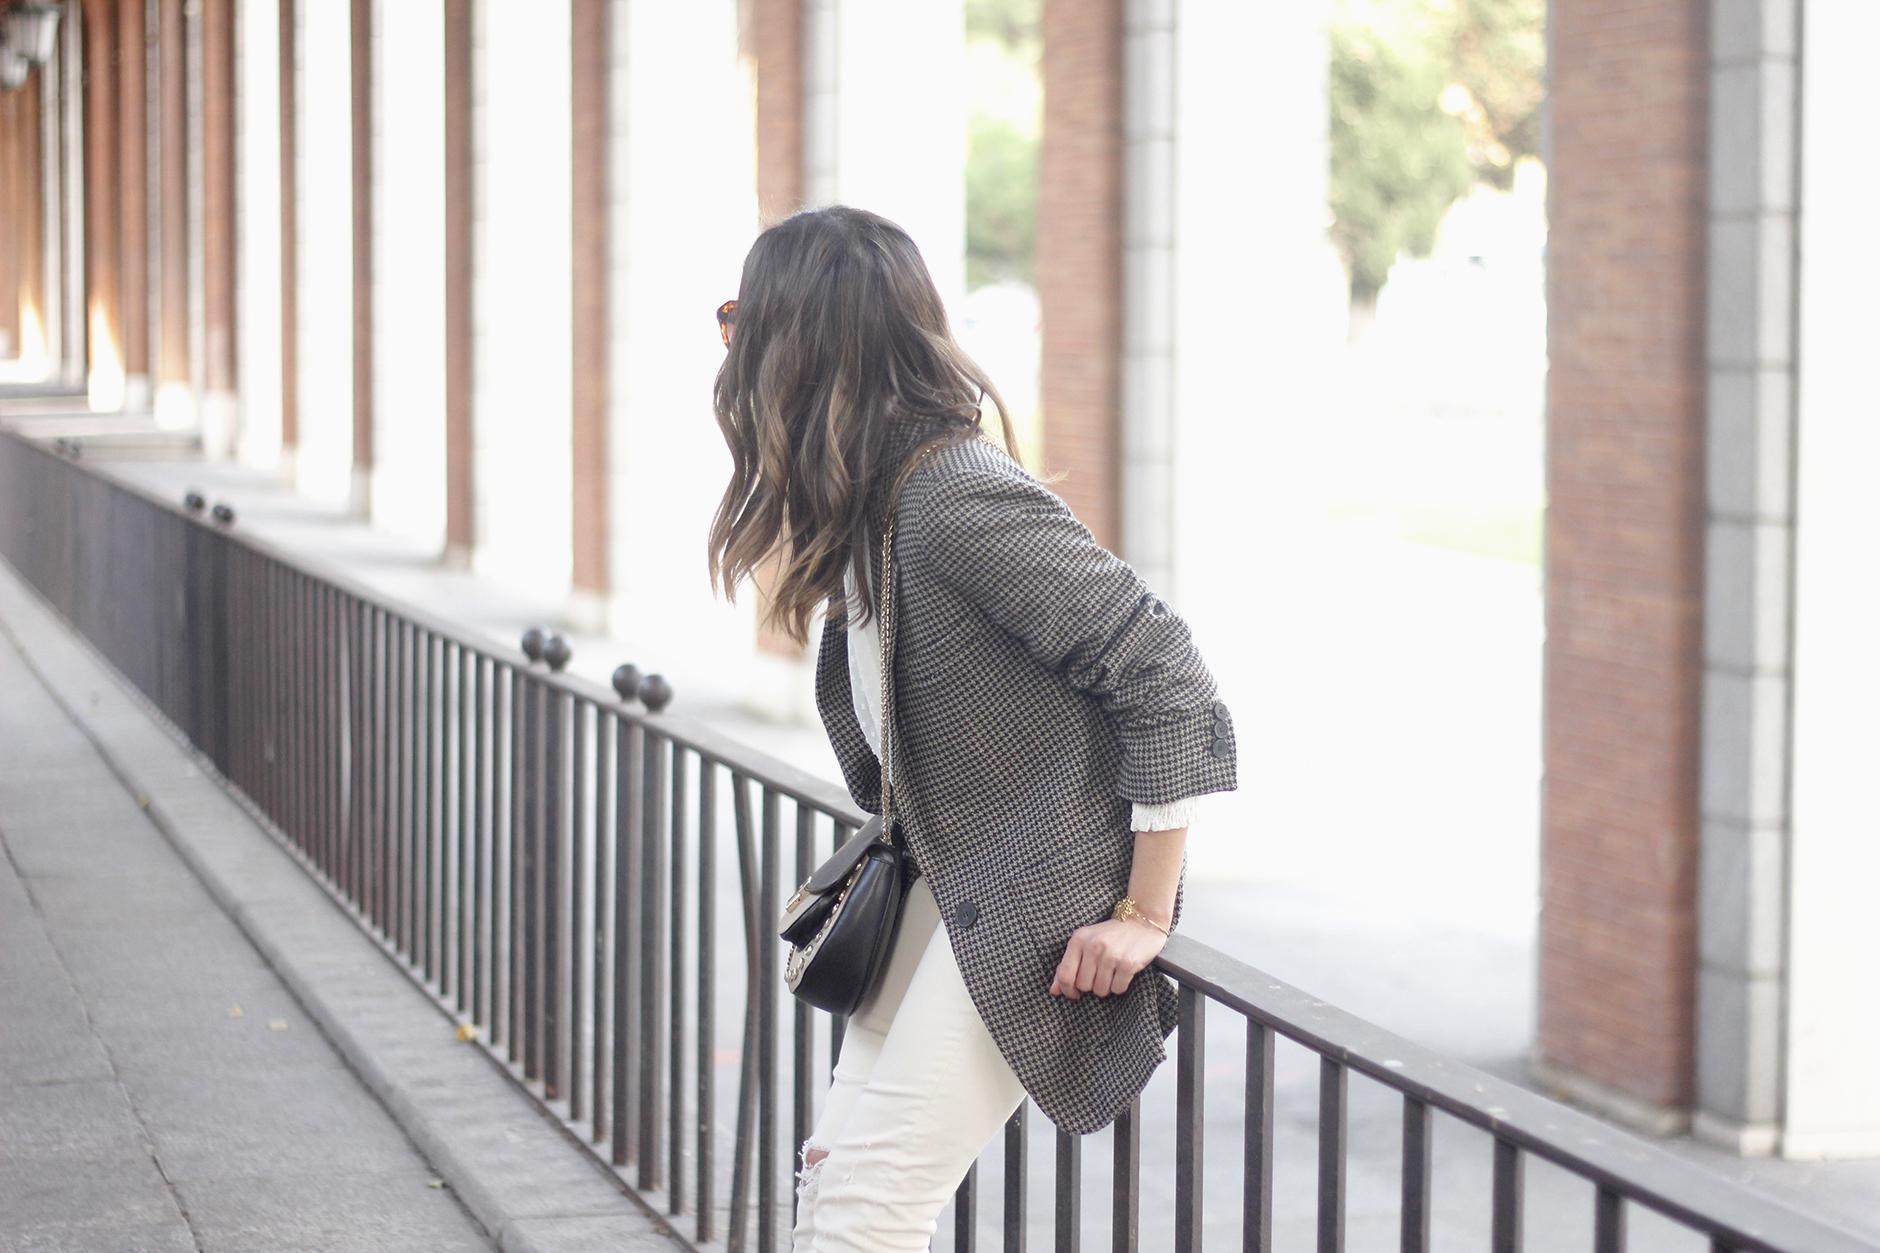 Plumeti blouse houndstooth blazer white jeans outfit style streetstyle04